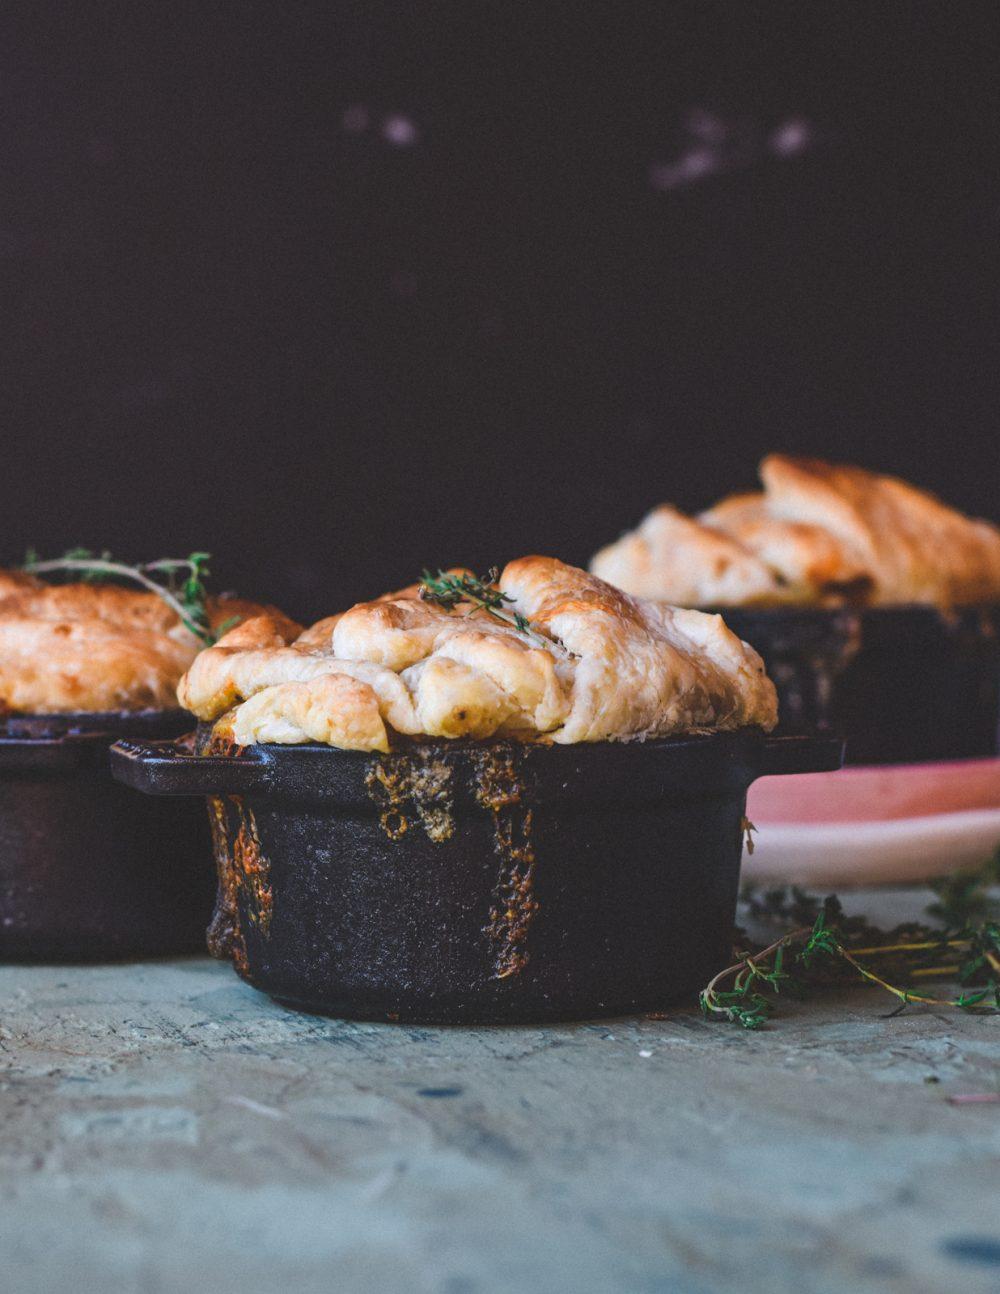 5 Comfort Vegetarian Recipes To Taste This Fall: Festive Crunchy and Creamy Onion + Mushroom + Potato Pot Pies